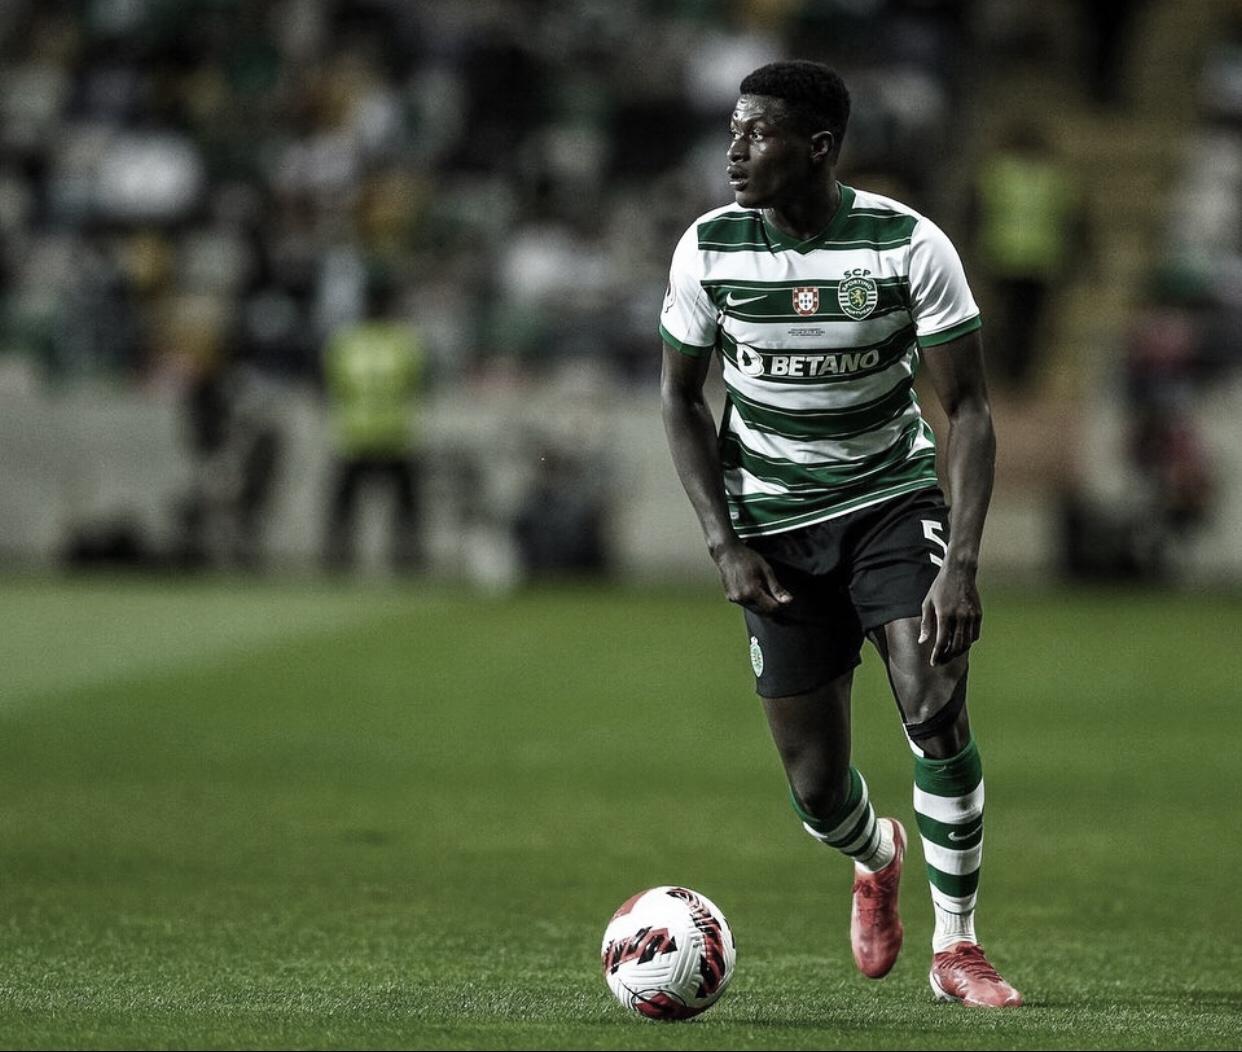 PSG anuncia lateral-esquerdo Nuno Mendes como novo reforço para temporada